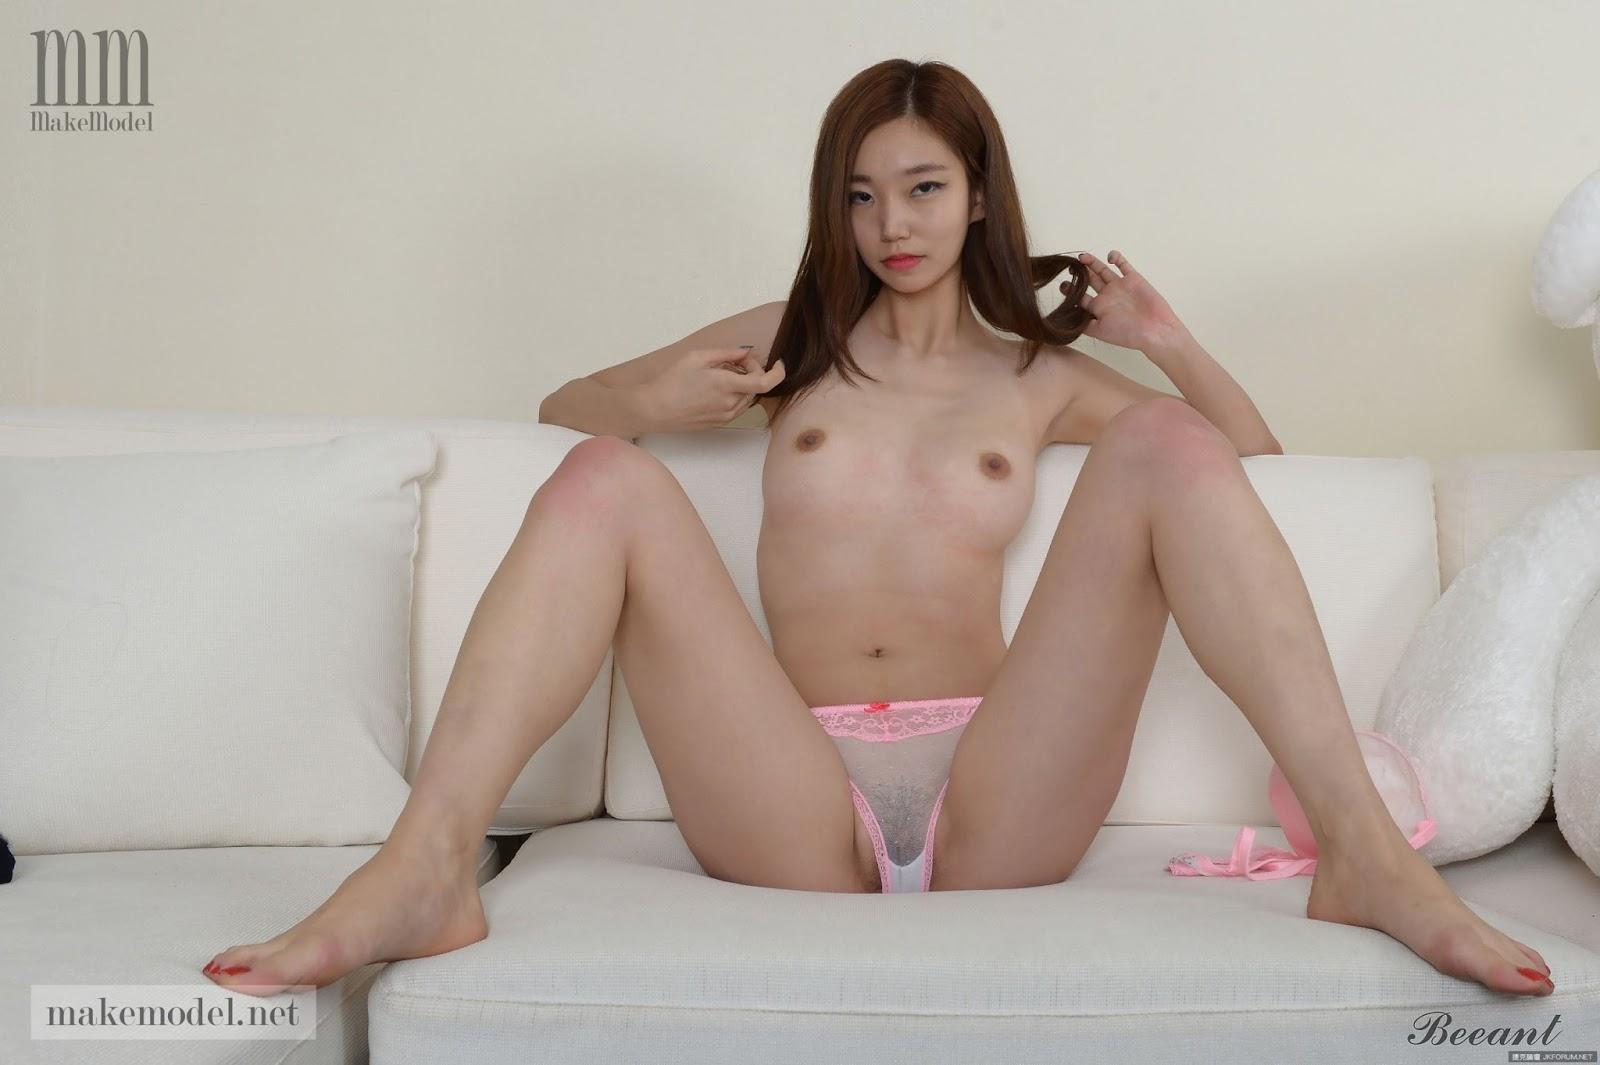 270912 3455 - Korean Nude - Big Albom Remain #A-korean girl